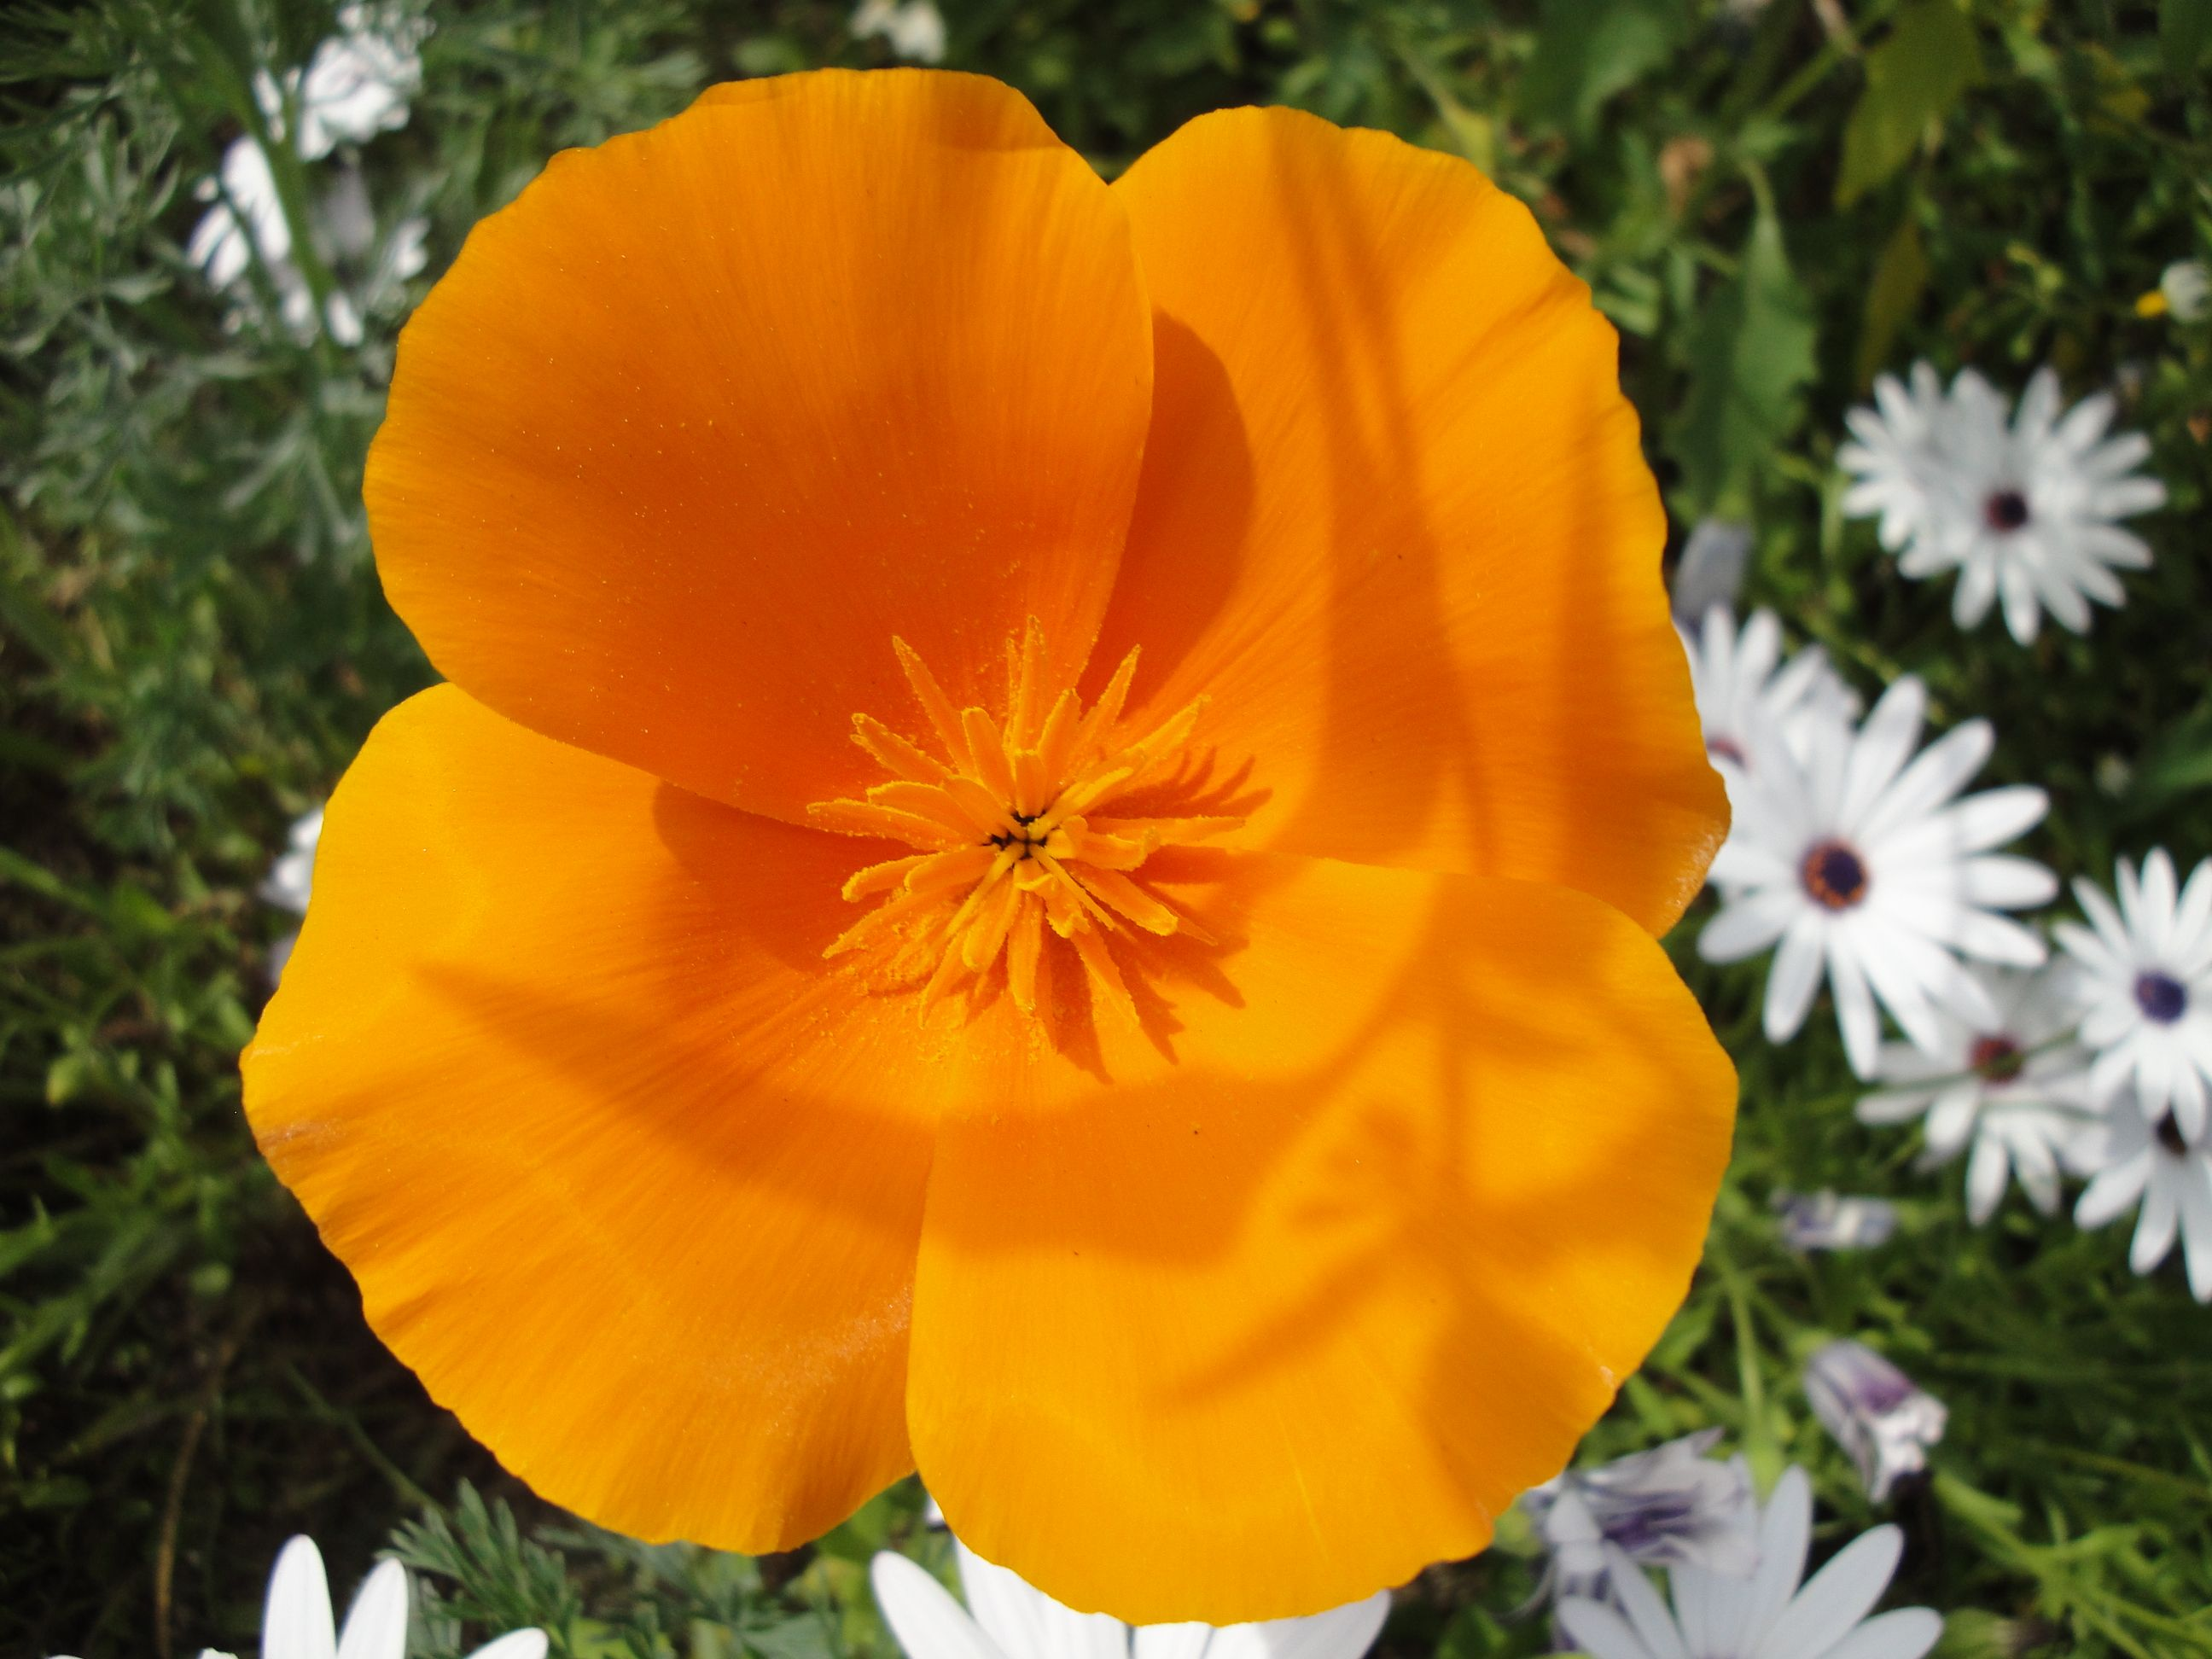 Pics For California State Flower